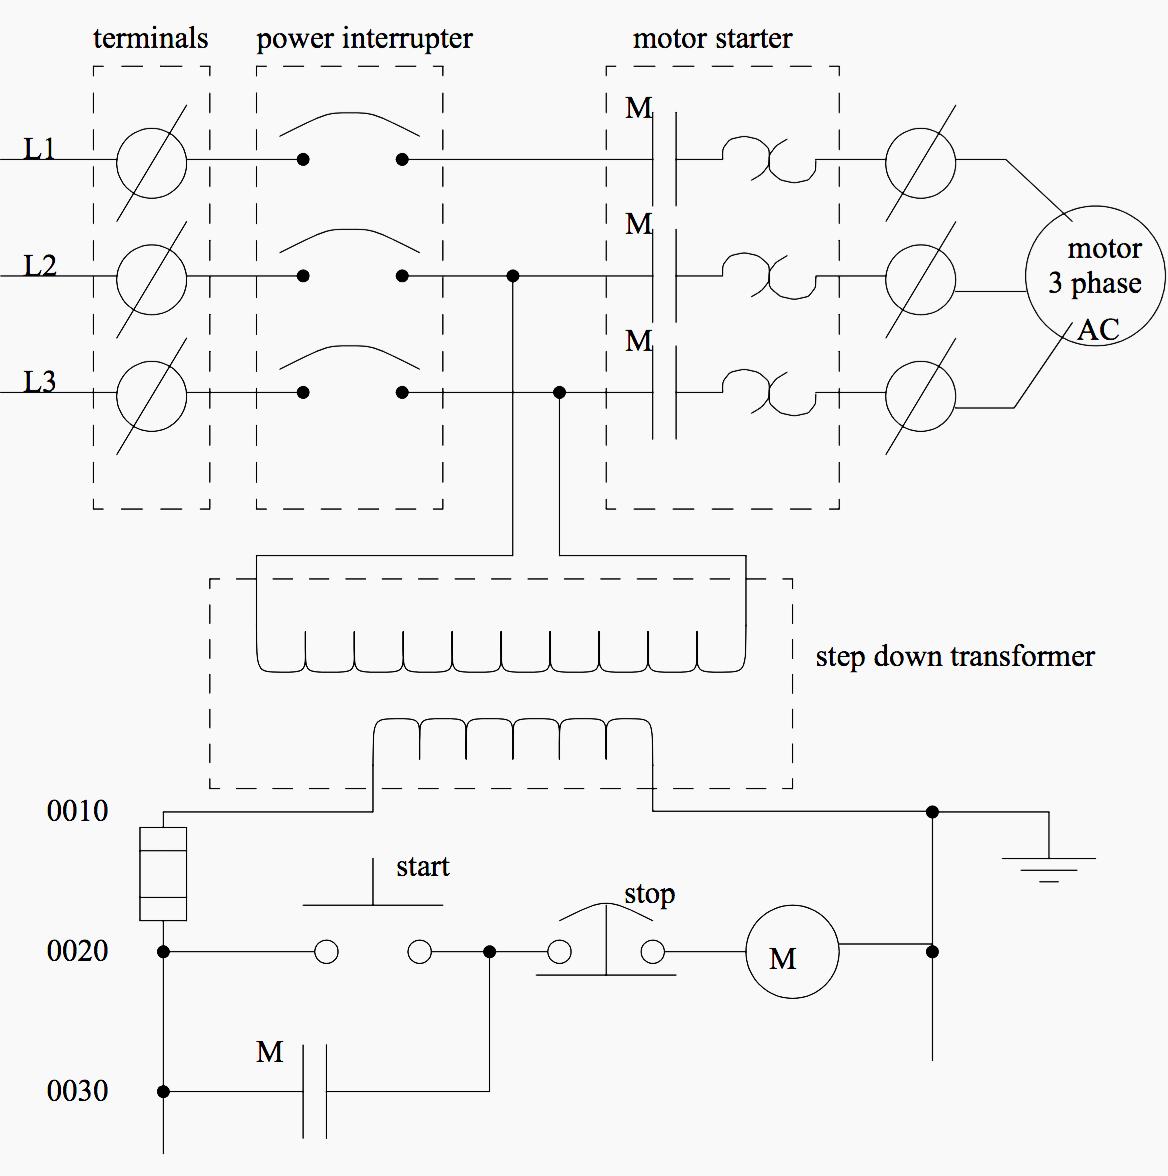 allen bradley plc wiring diagrams smart car horn diagram for gt and schematics schematic free you u2022 rh fashionality store ladder